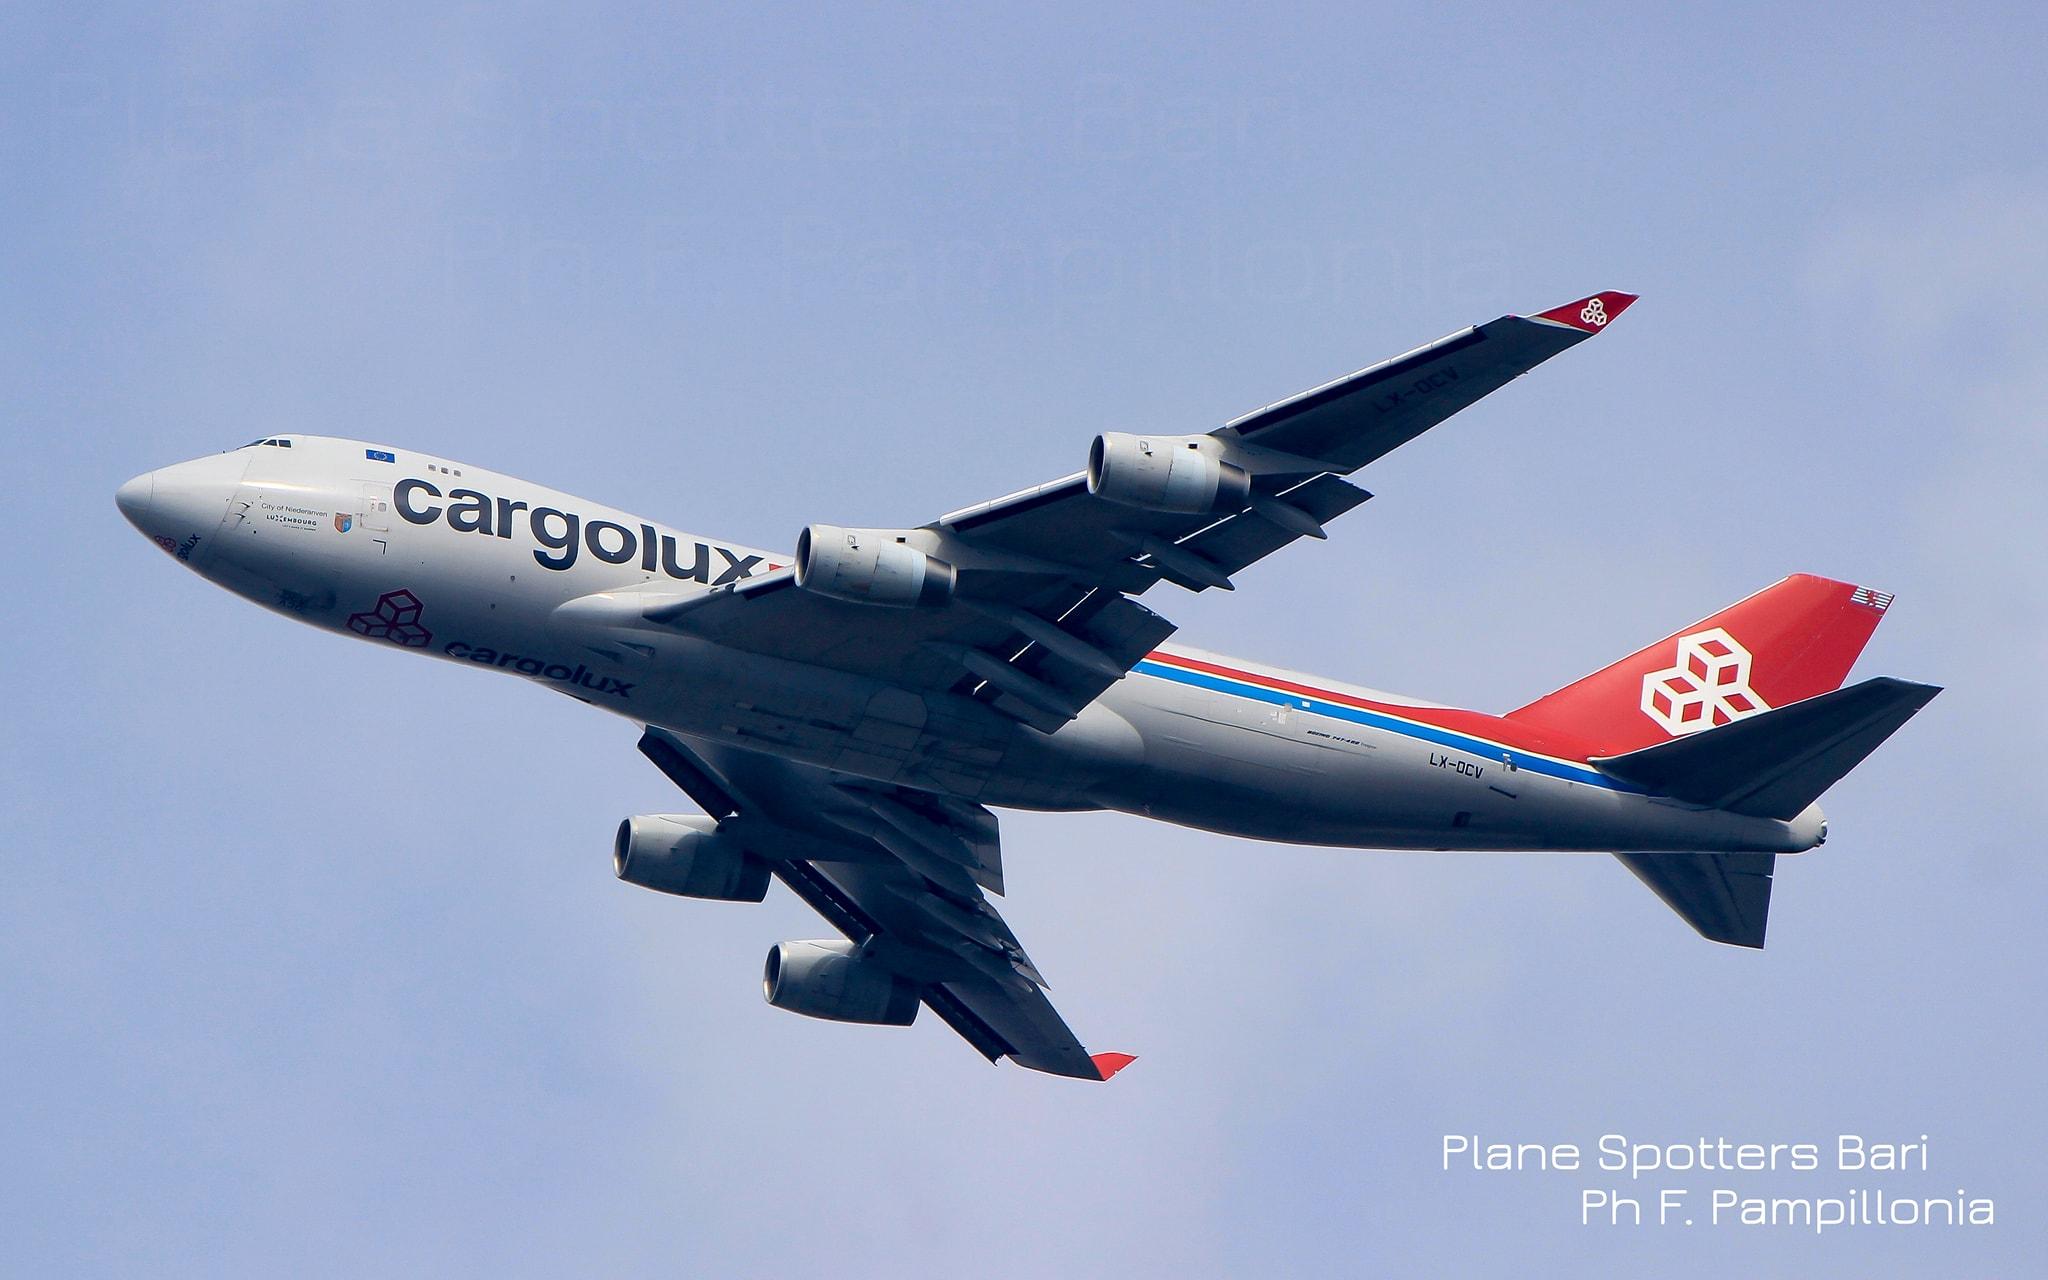 Boeing B747-400 cargolux